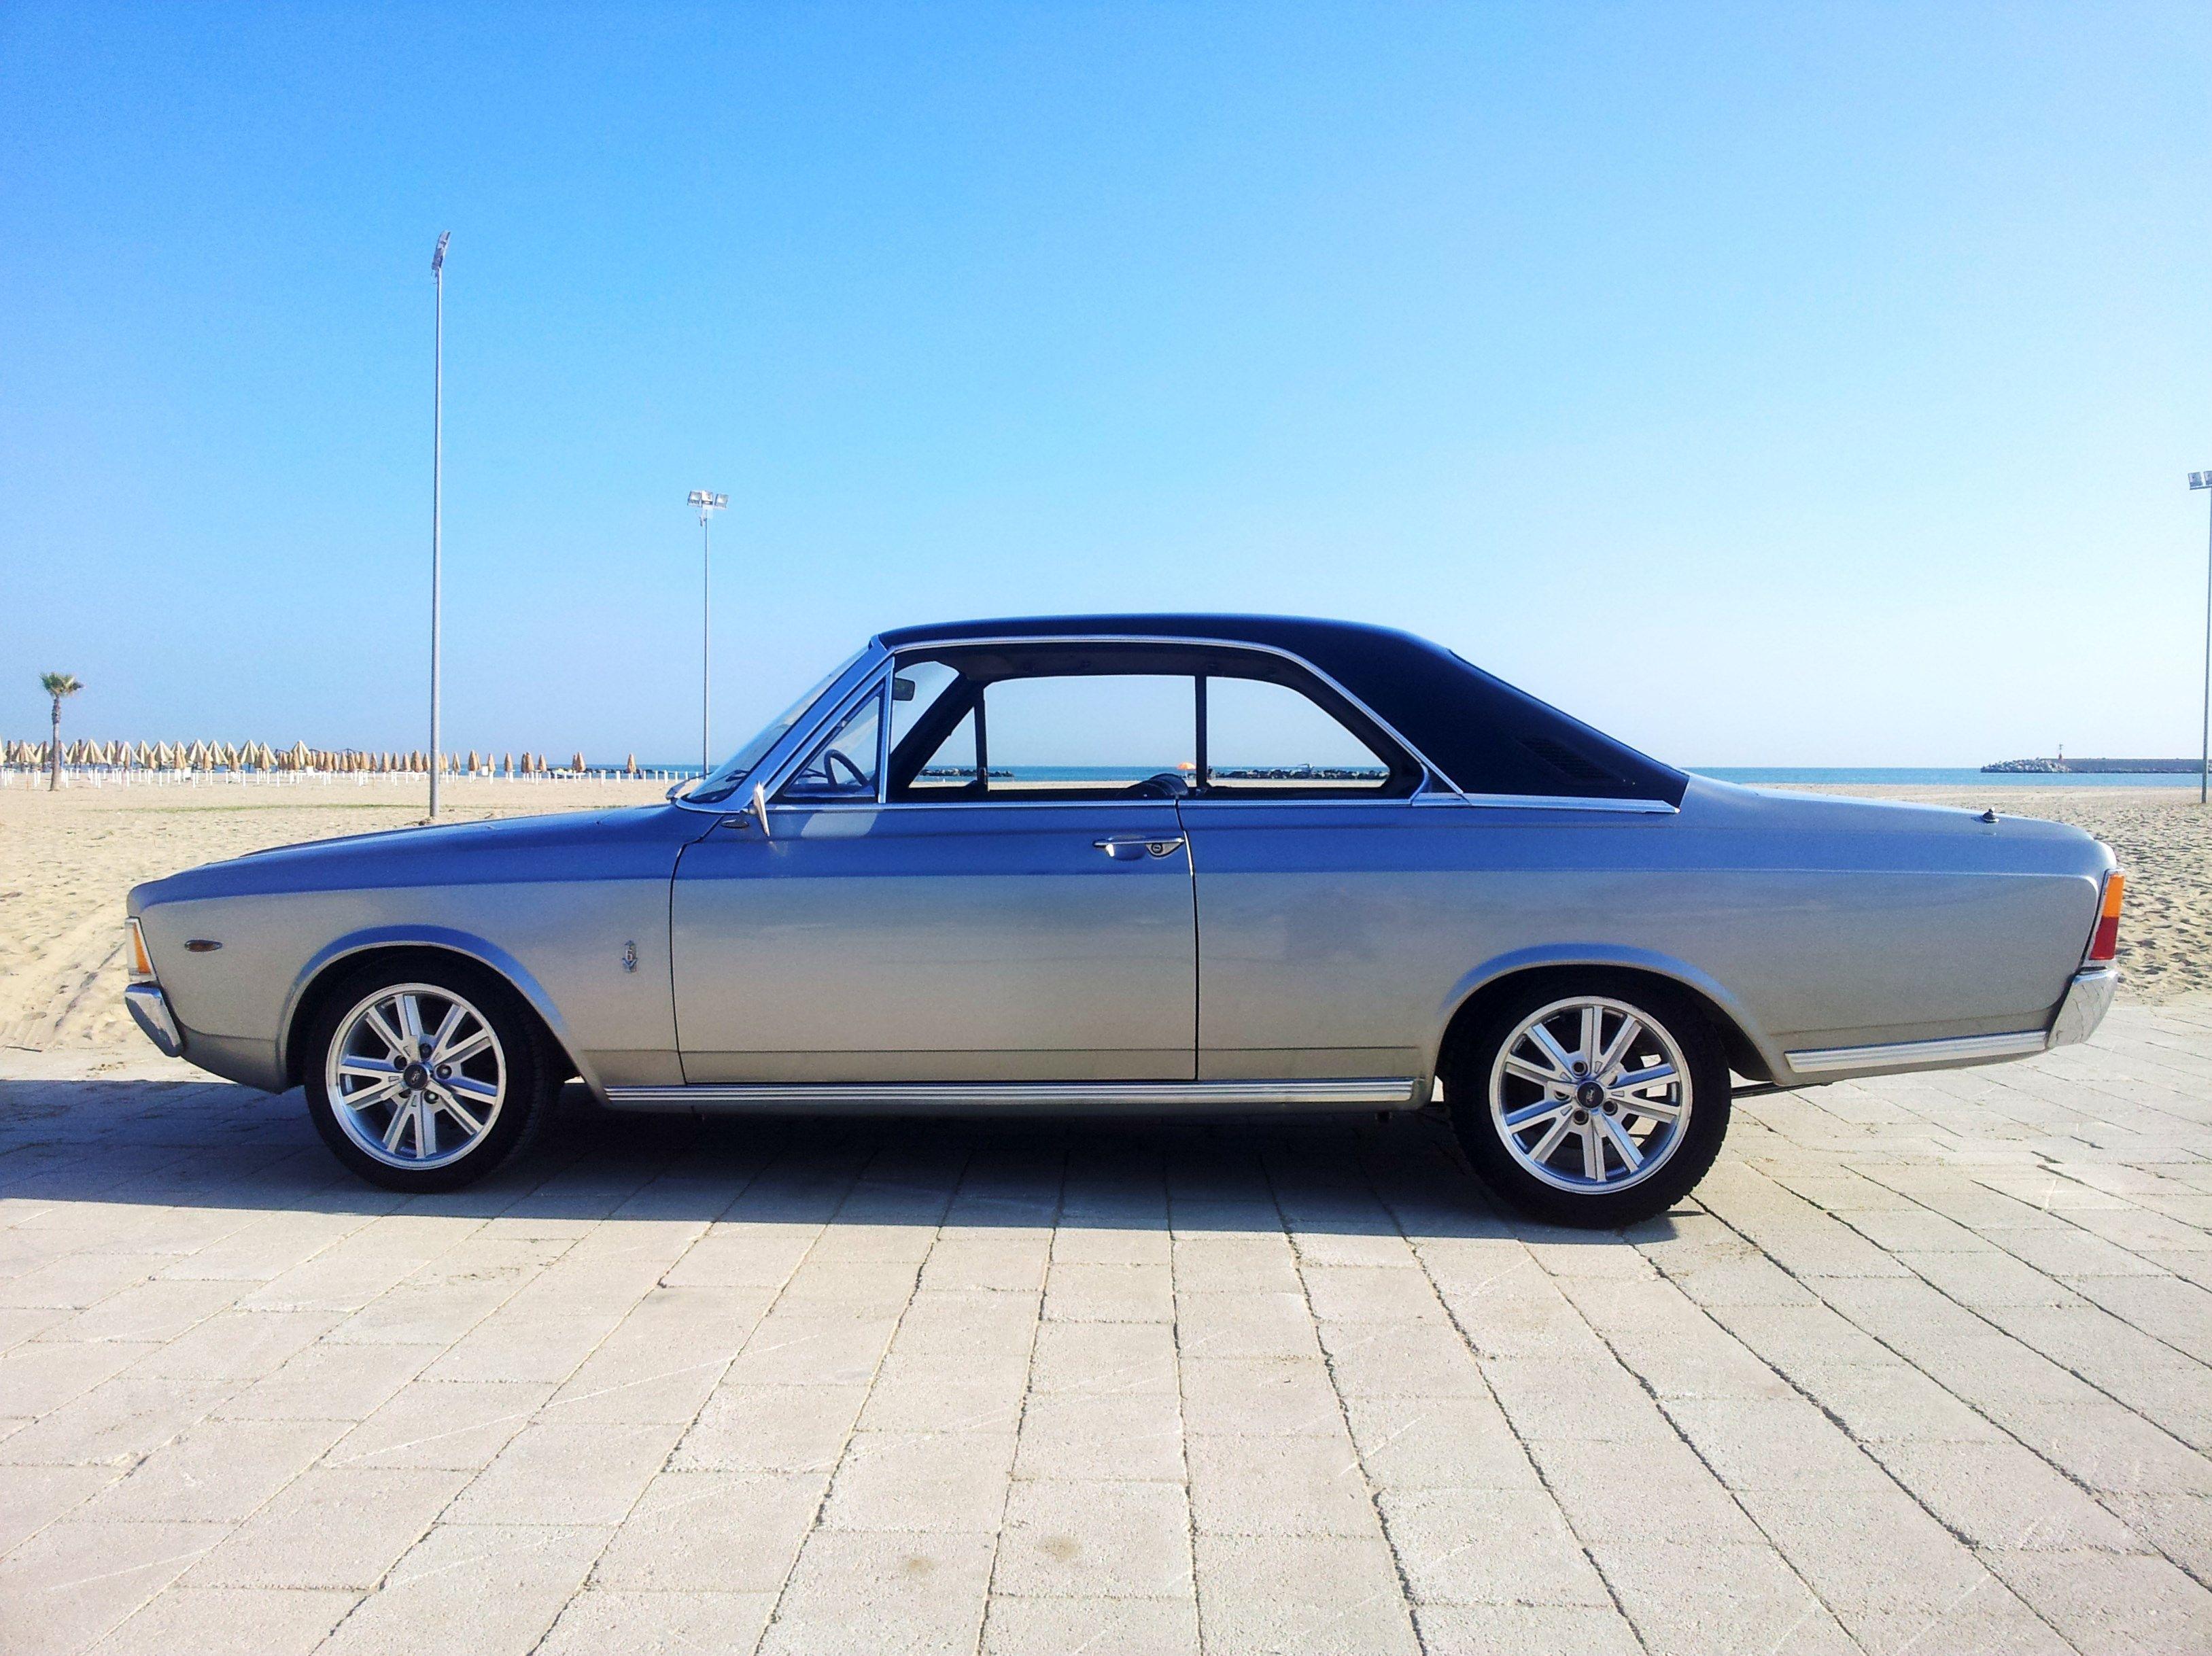 Ford Taunus Coupe 2300s Xl V6 Anno 1968 X Info Tel 3345717642